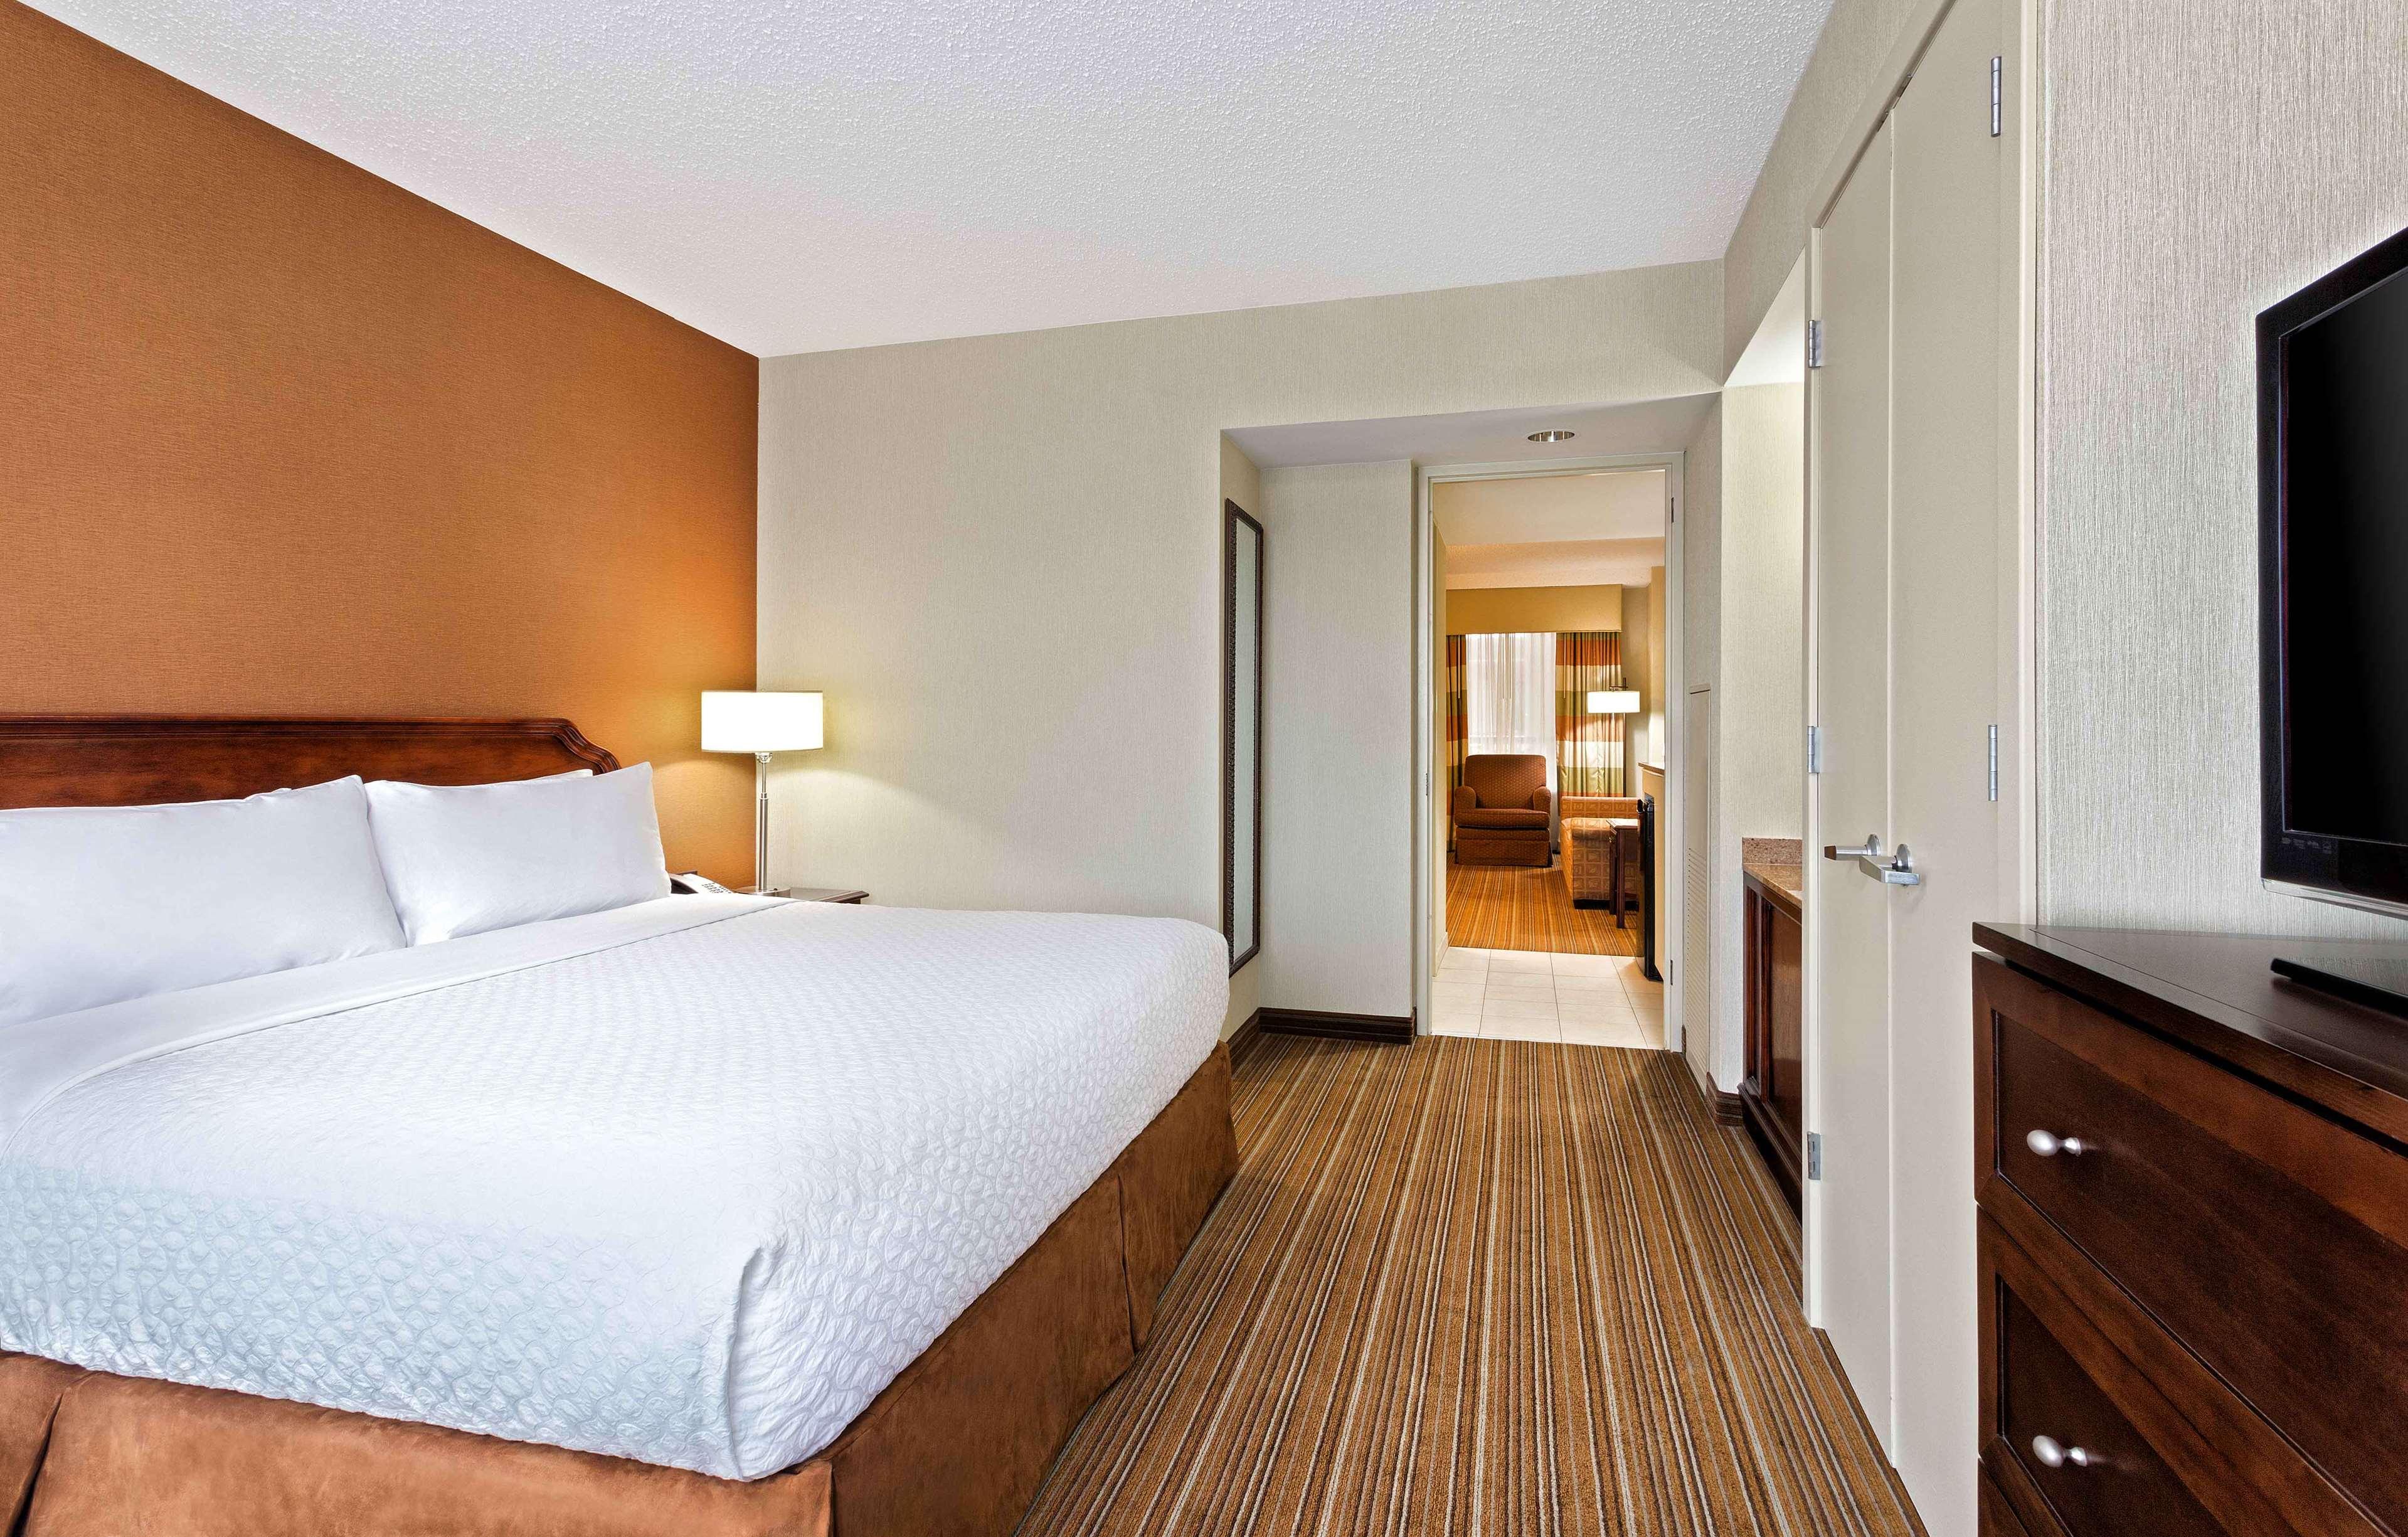 DoubleTree by Hilton Hotel Detroit - Dearborn image 12